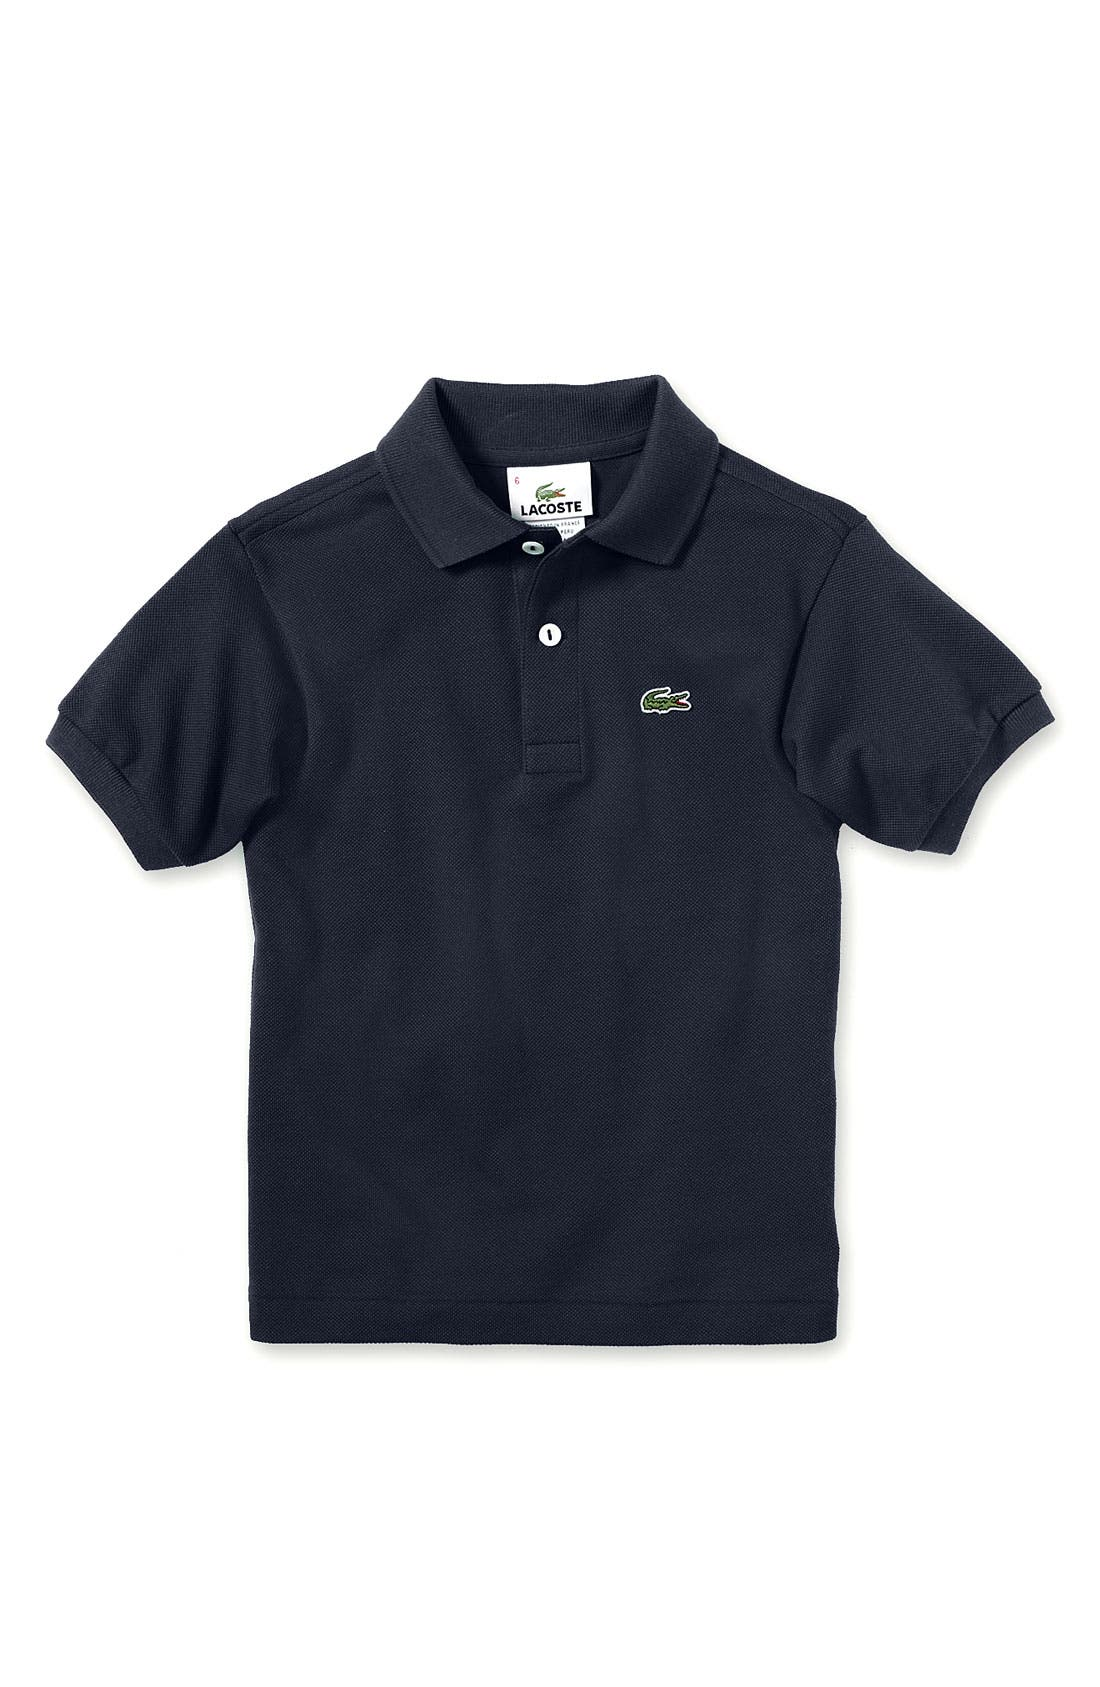 Alternate Image 1 Selected - Lacoste Short Sleeve Polo (Toddler Boys & Little Boys)